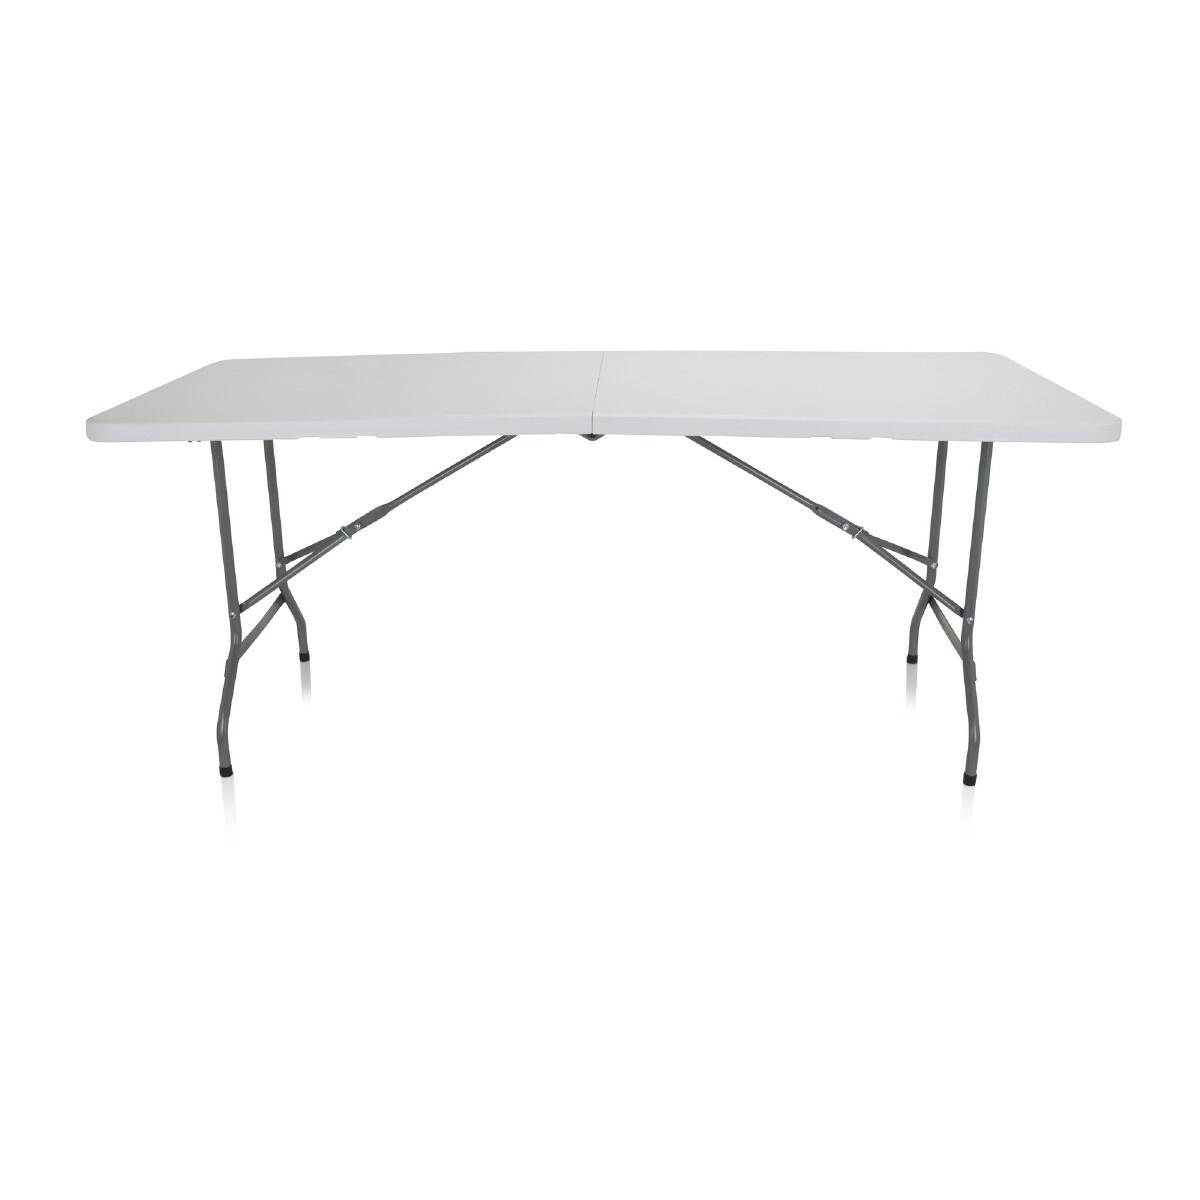 Hjh Office Table pliante EASY UP MULTI I 180 x 74 cm plastique blanc hjh OFFICE